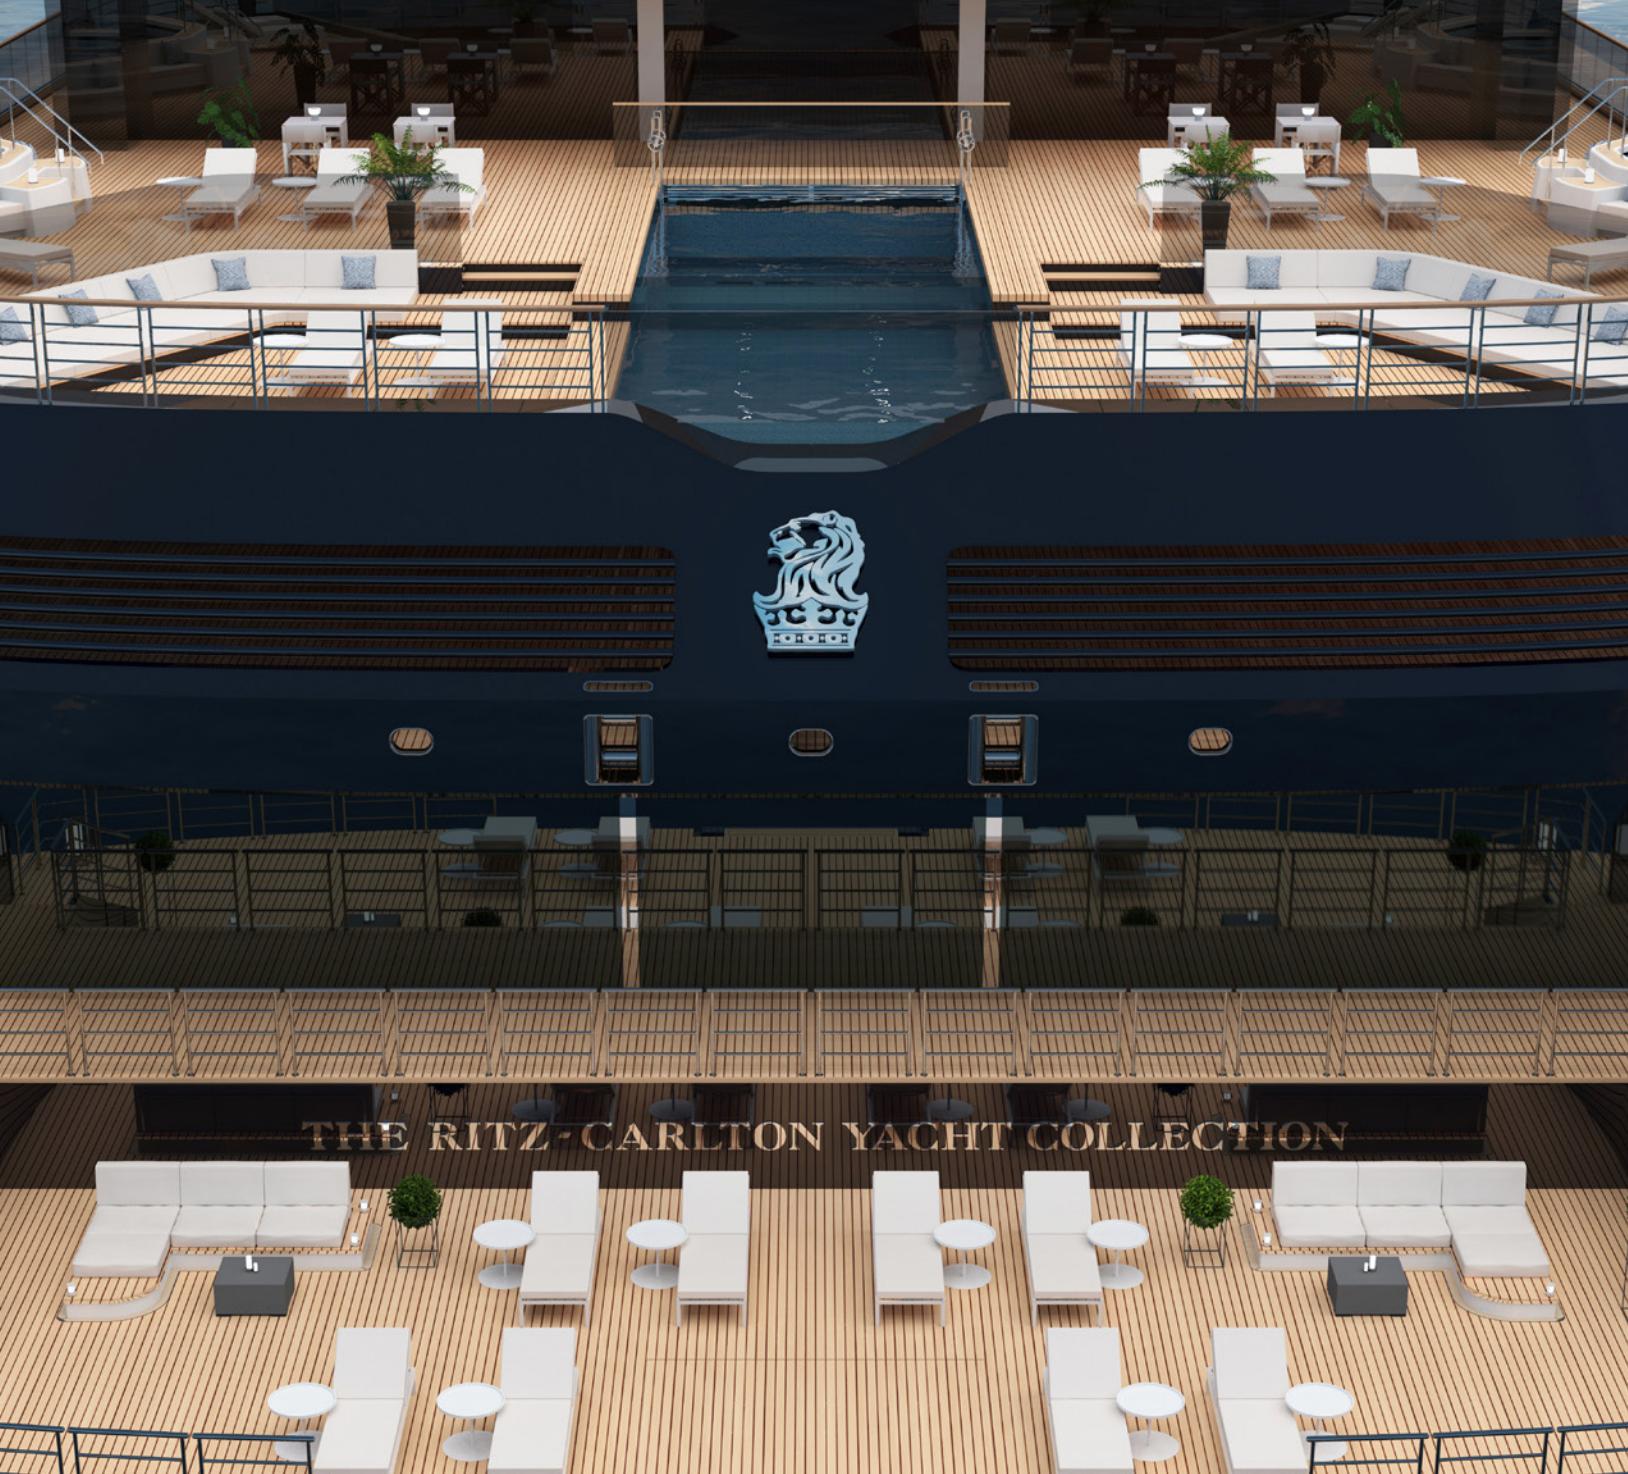 Ritz Carlton Yacht watersports platform